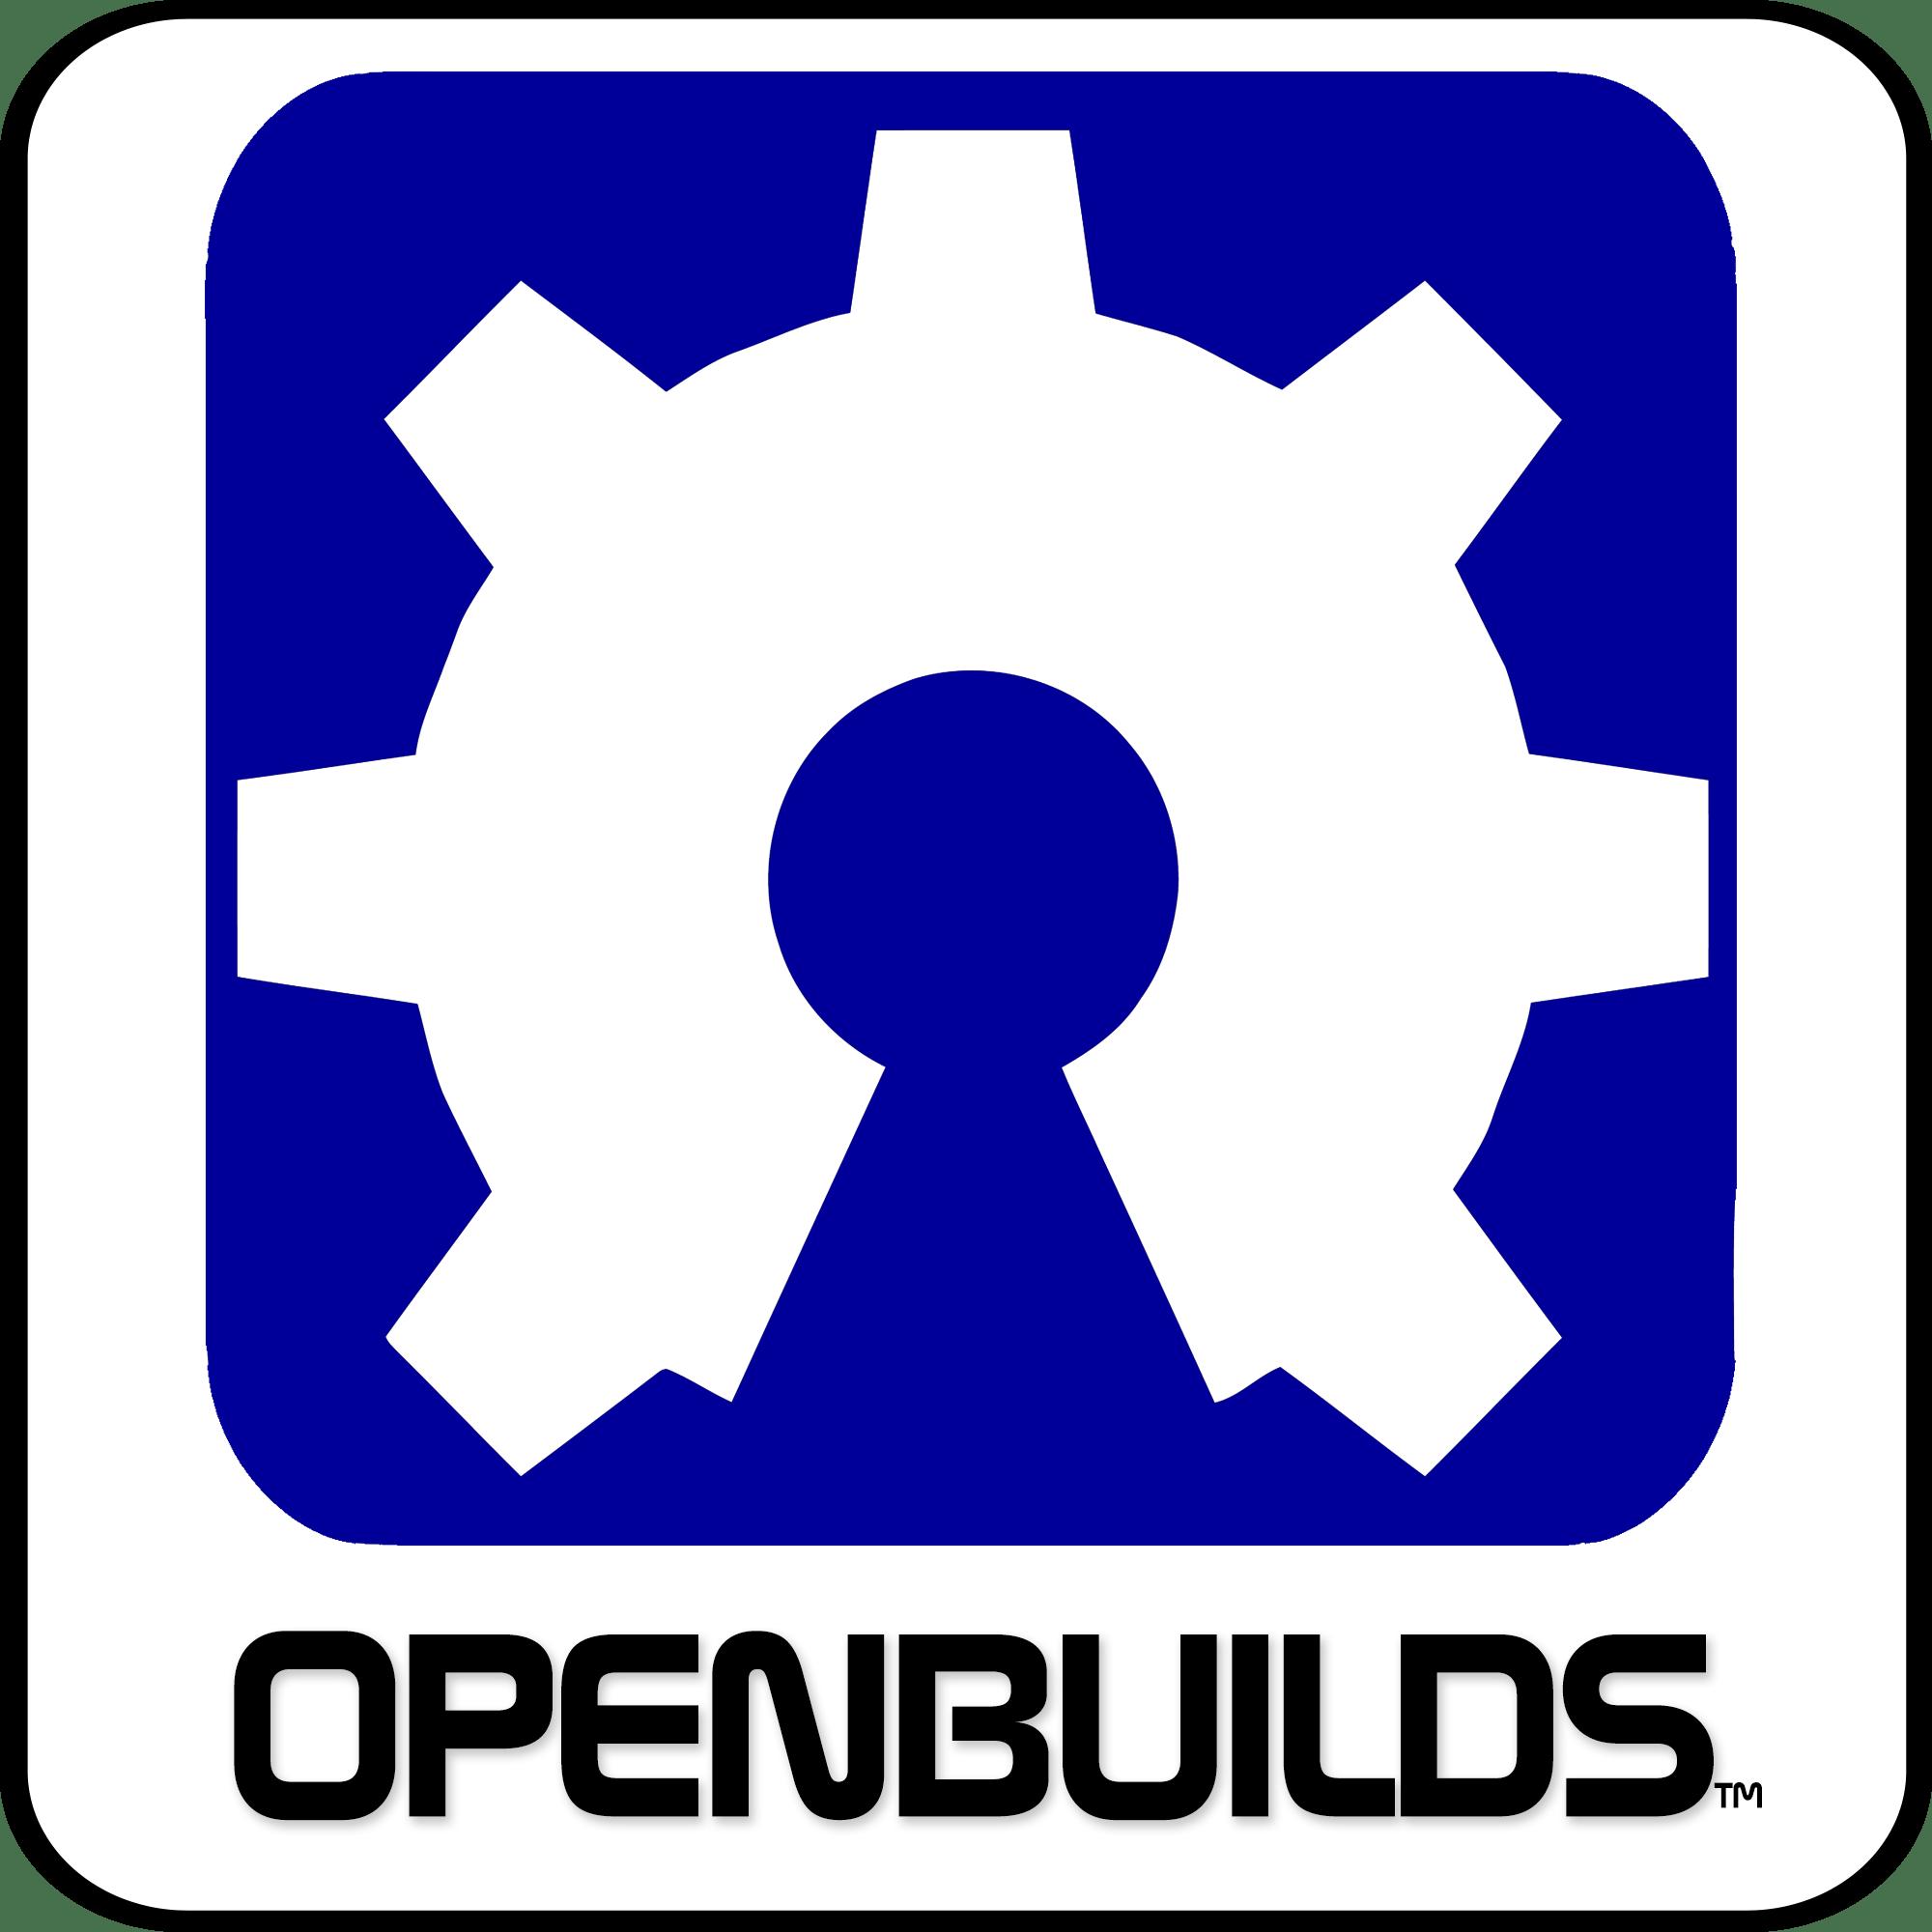 Openbuildslogo bluboxlarge hirez fat2   copy